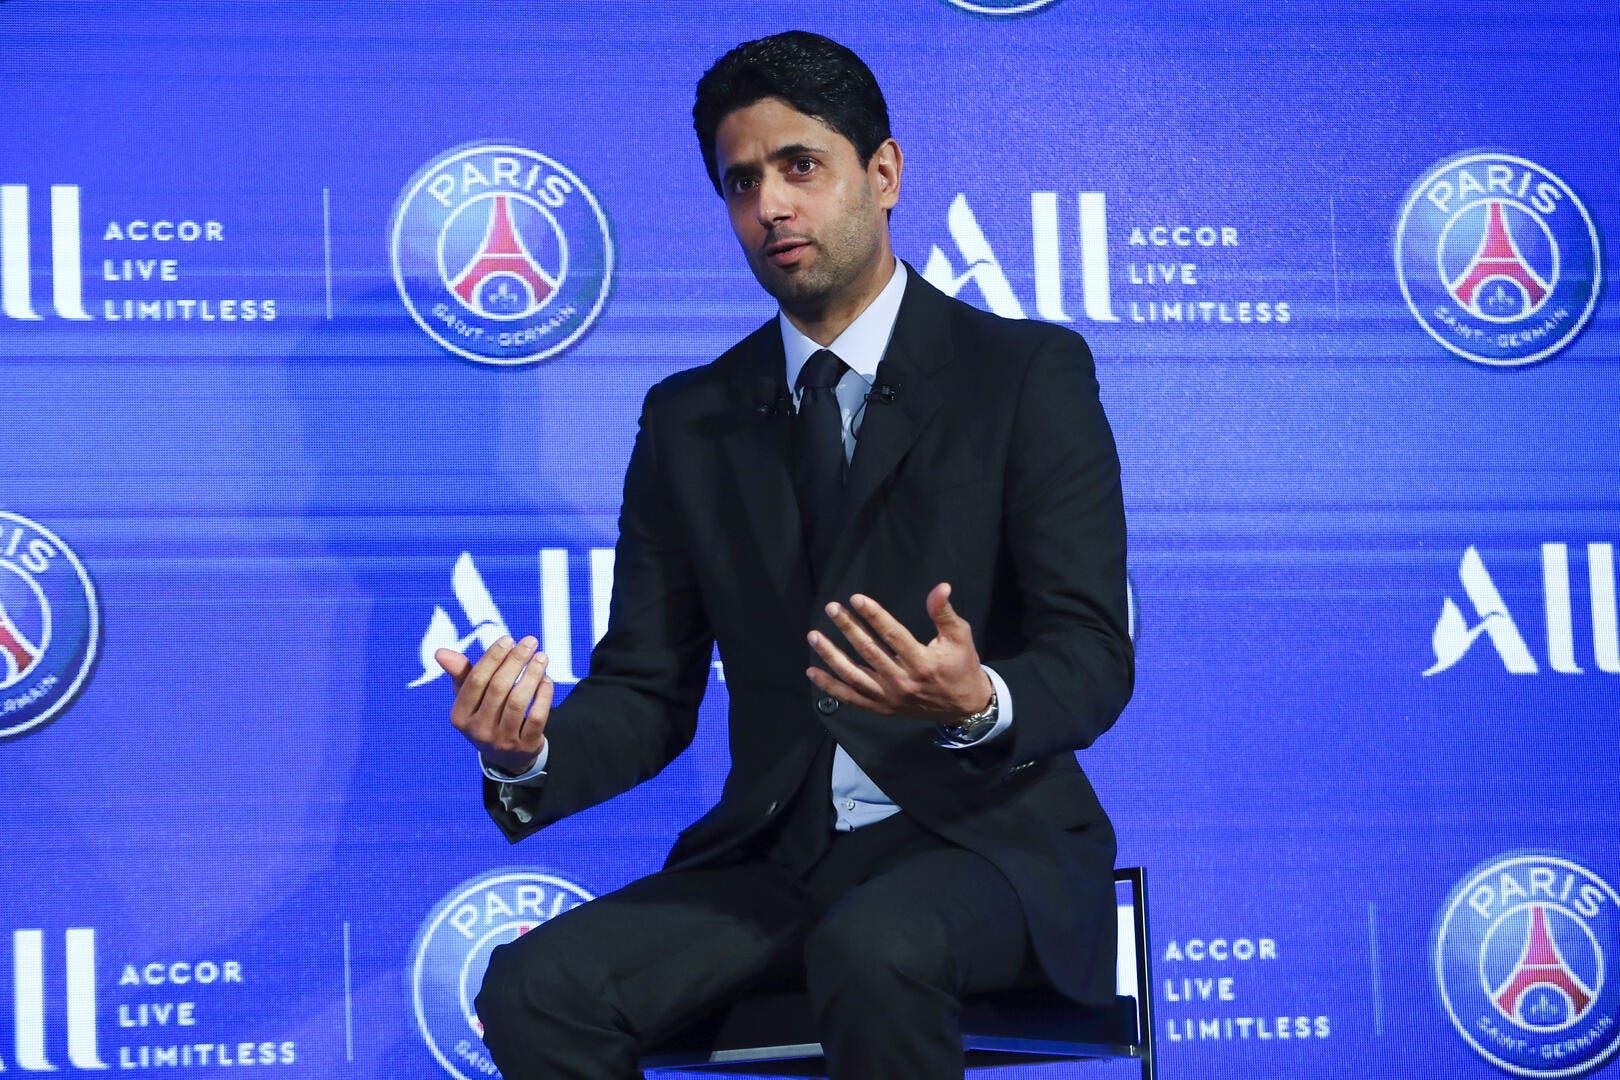 Foot PSG - PSG : Nasser Al-Khelaifi inculpé en Suisse ! - Foot 01